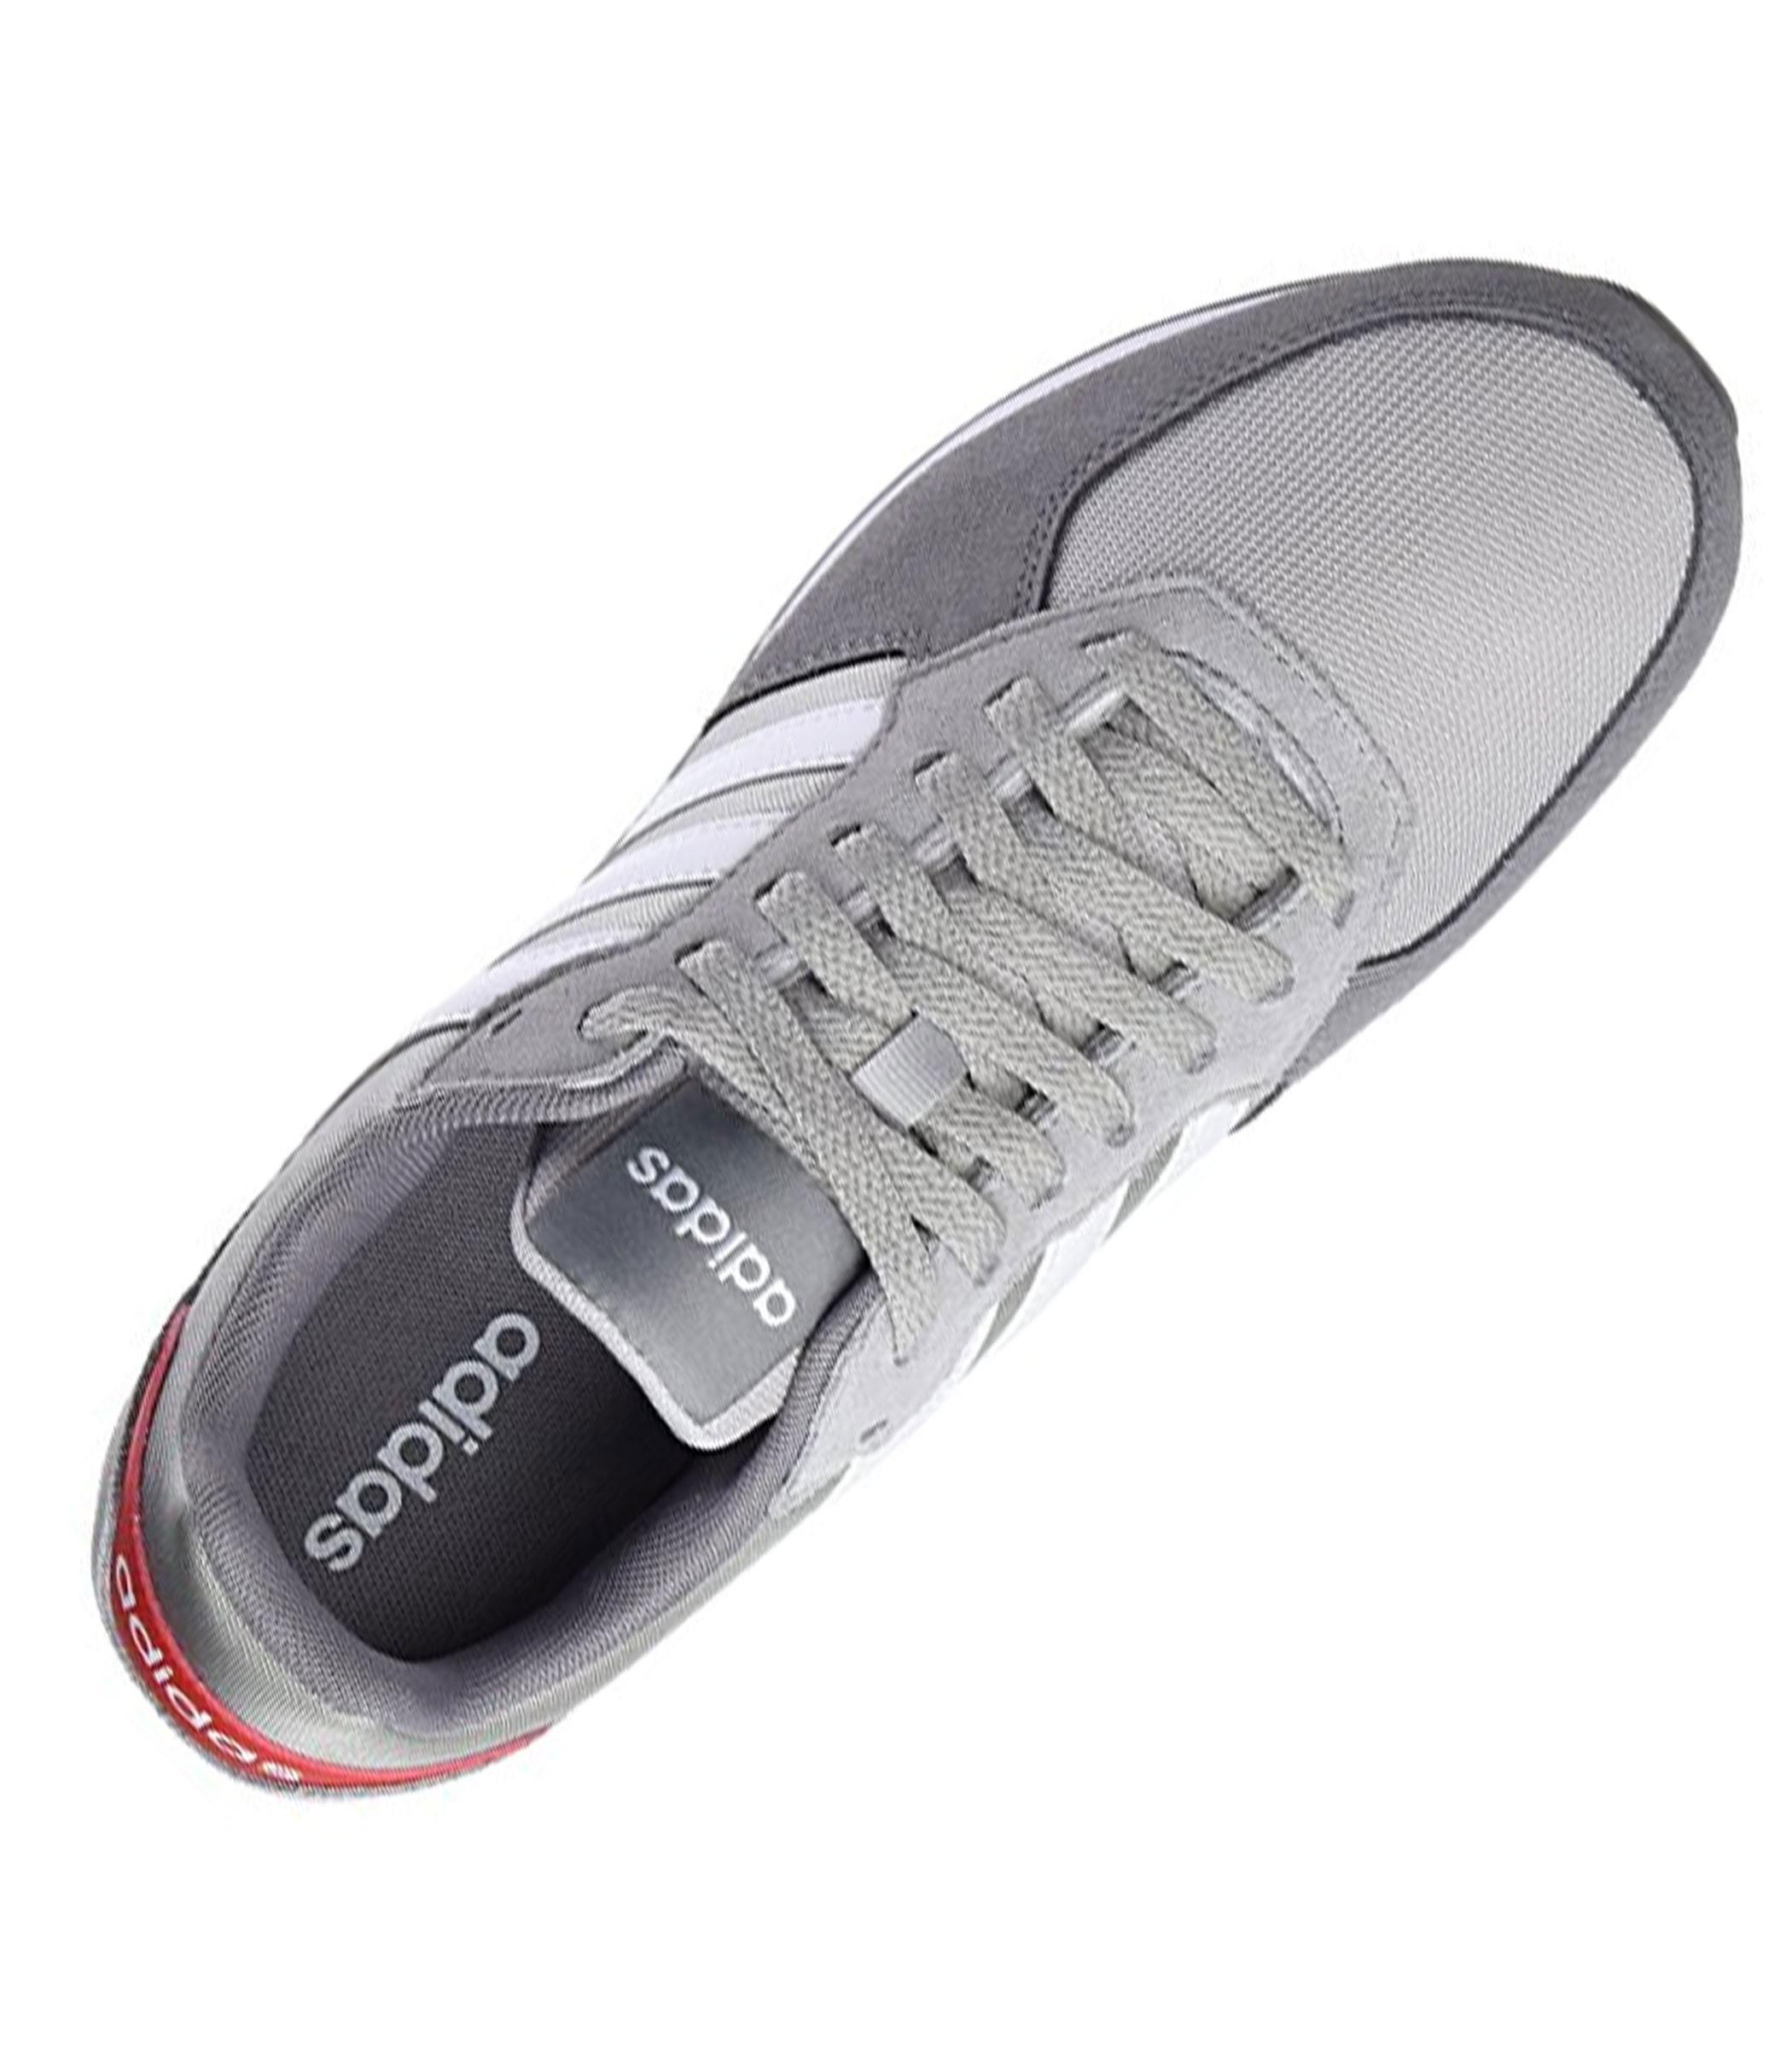 brand new 8978a b7527 Scarpe Running Adidas 8k - Uomo rif. DB1730